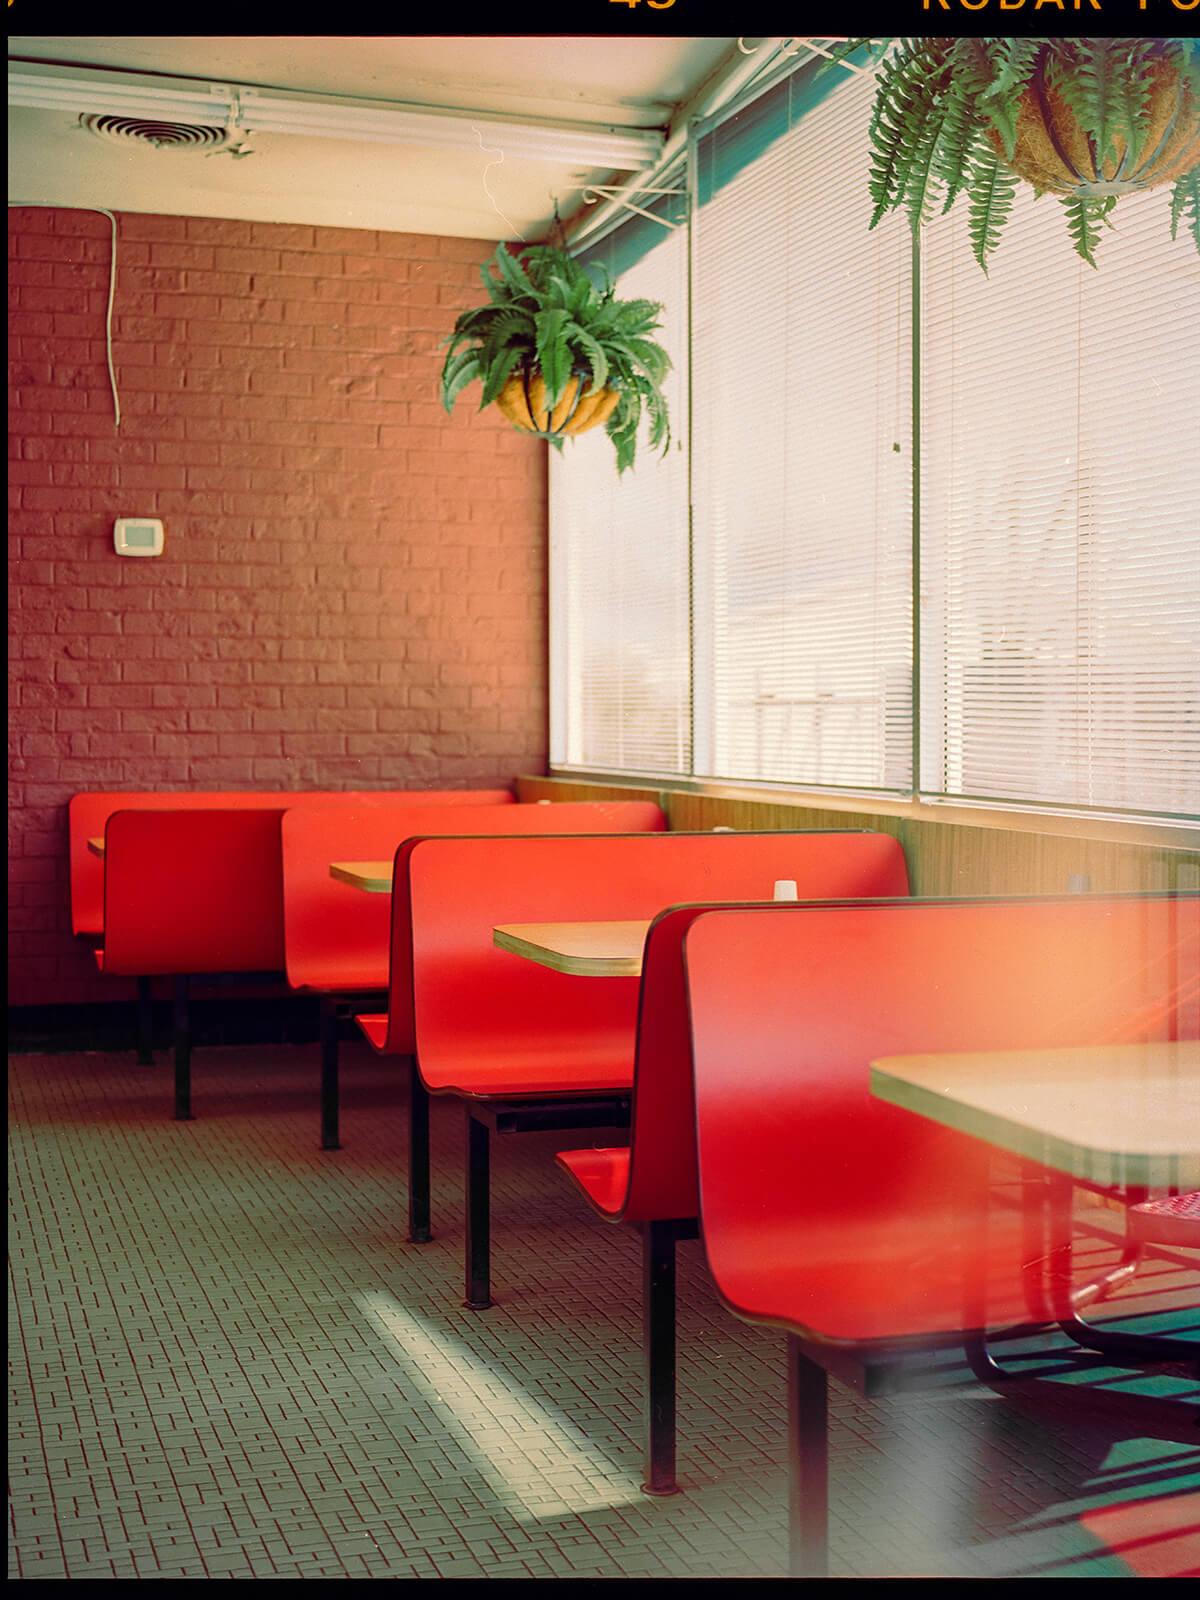 Blake Pope - historic diner in Charlotte, North Carolina